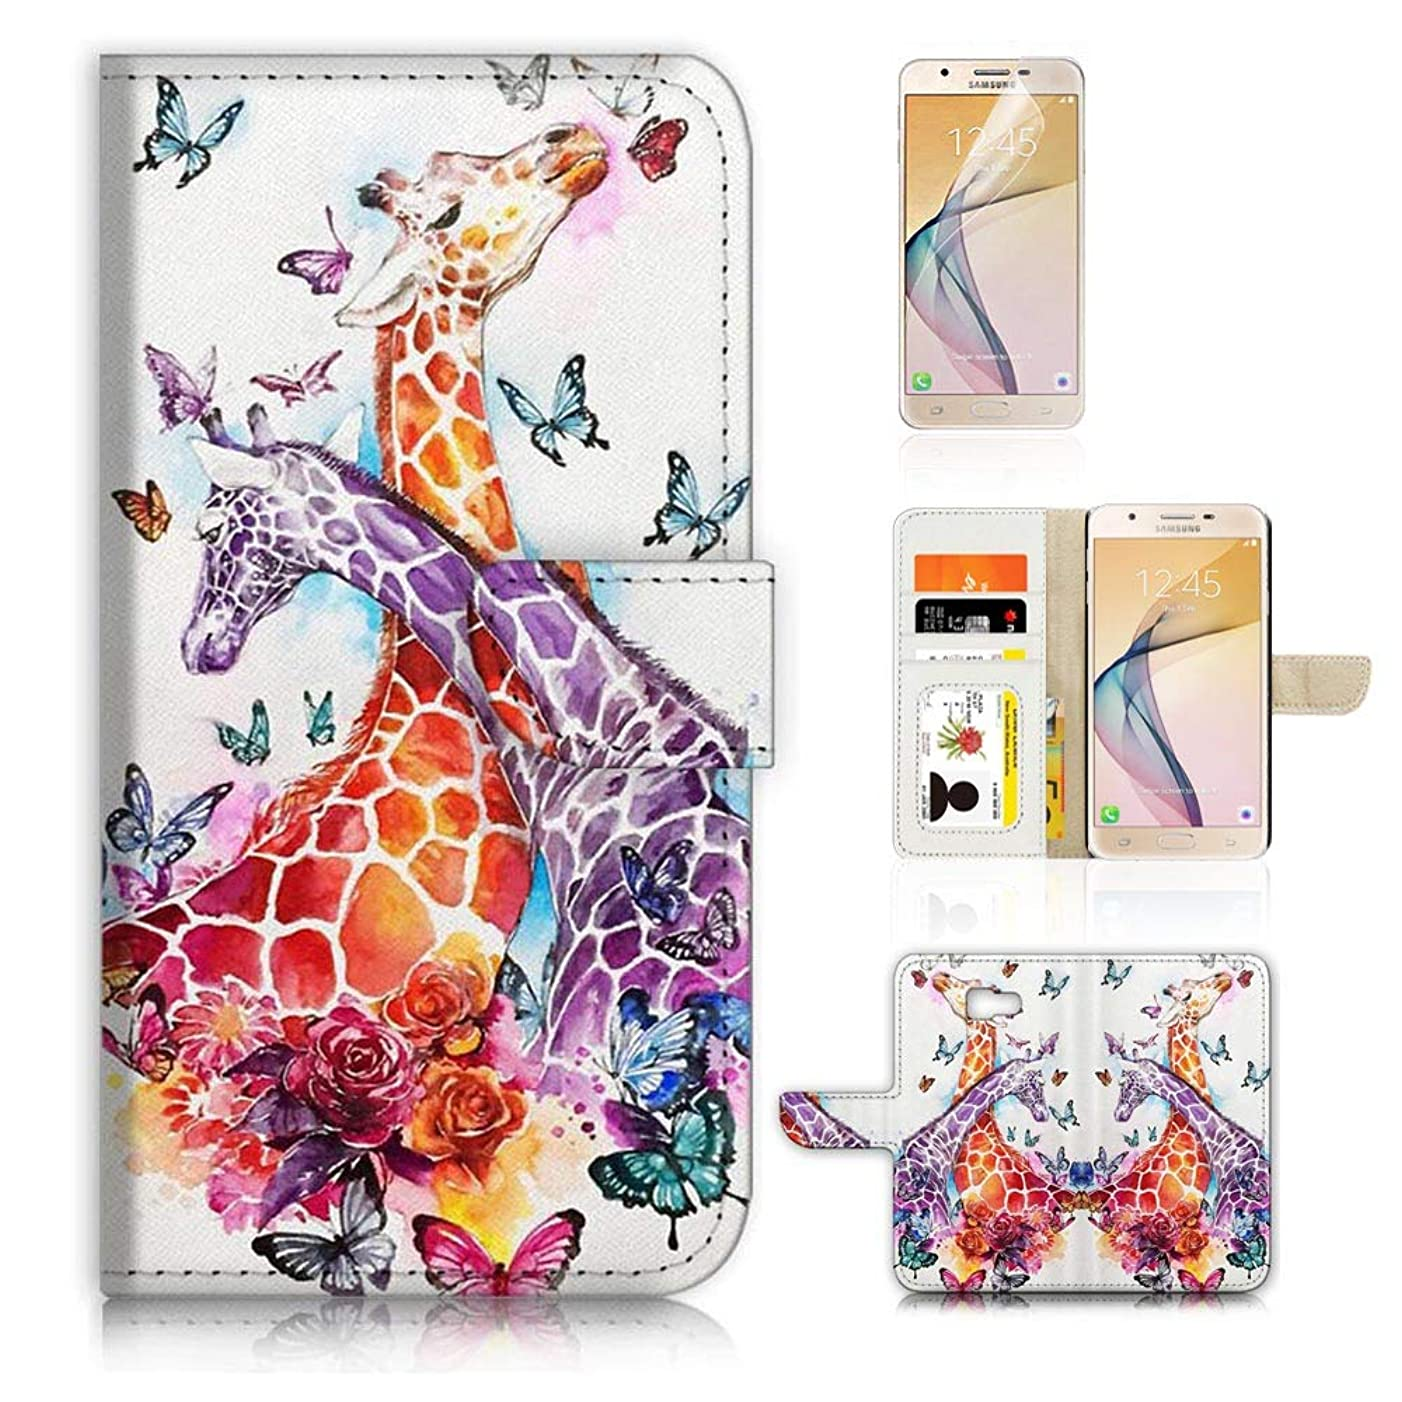 (for Samsung J7 Prime / J7 V / J7 Perx / J7 2017 / J7 Sky Pro/Galaxy Halo) Flip Wallet Style Case Cover, Shock Protection Design with Screen Protector - B31193 Giraffe